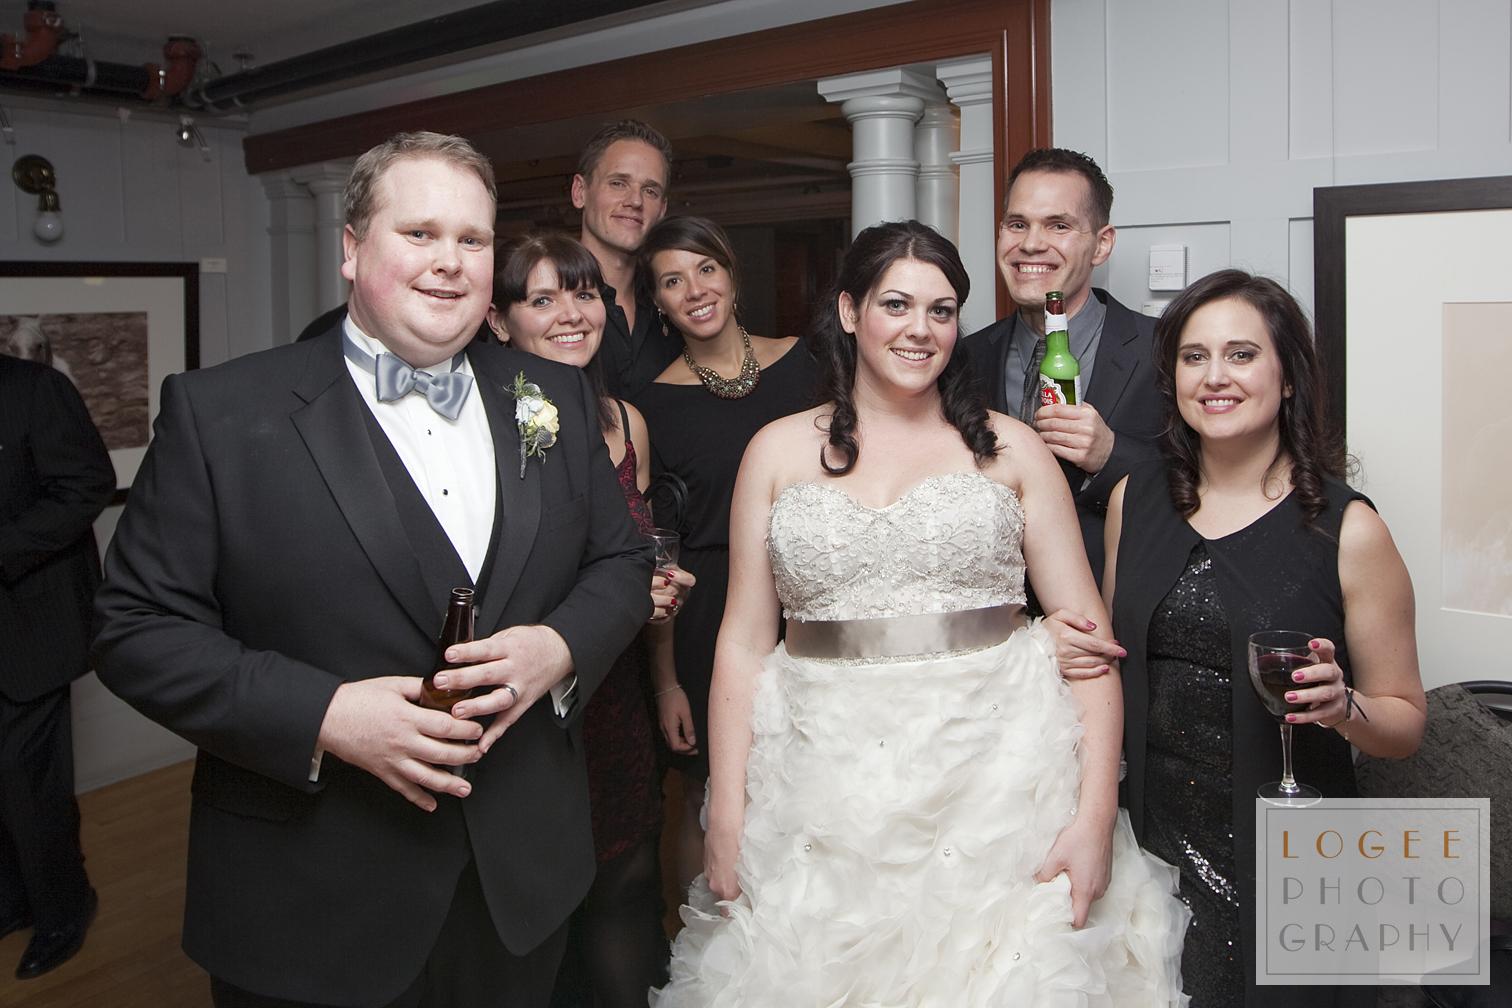 McIntosh-Burns Wedding - 7254Aw